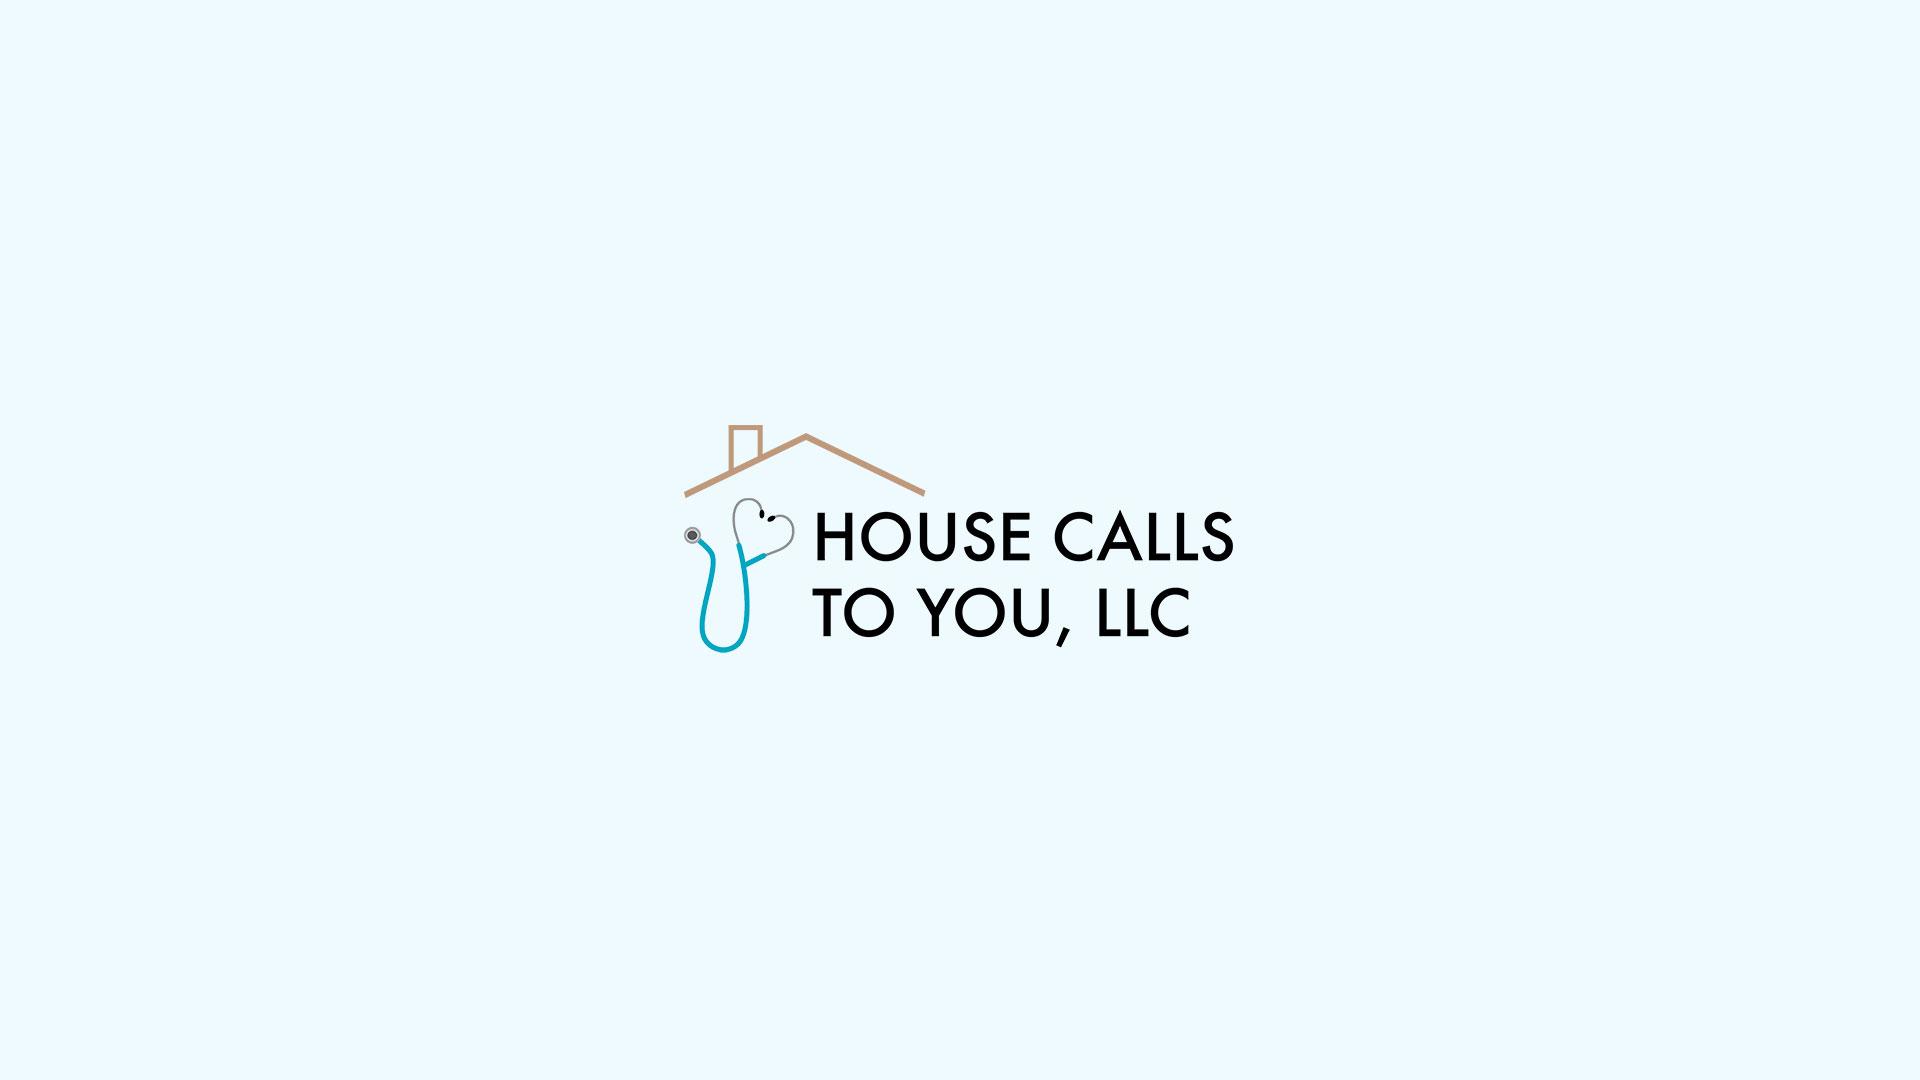 housecalls.jpg